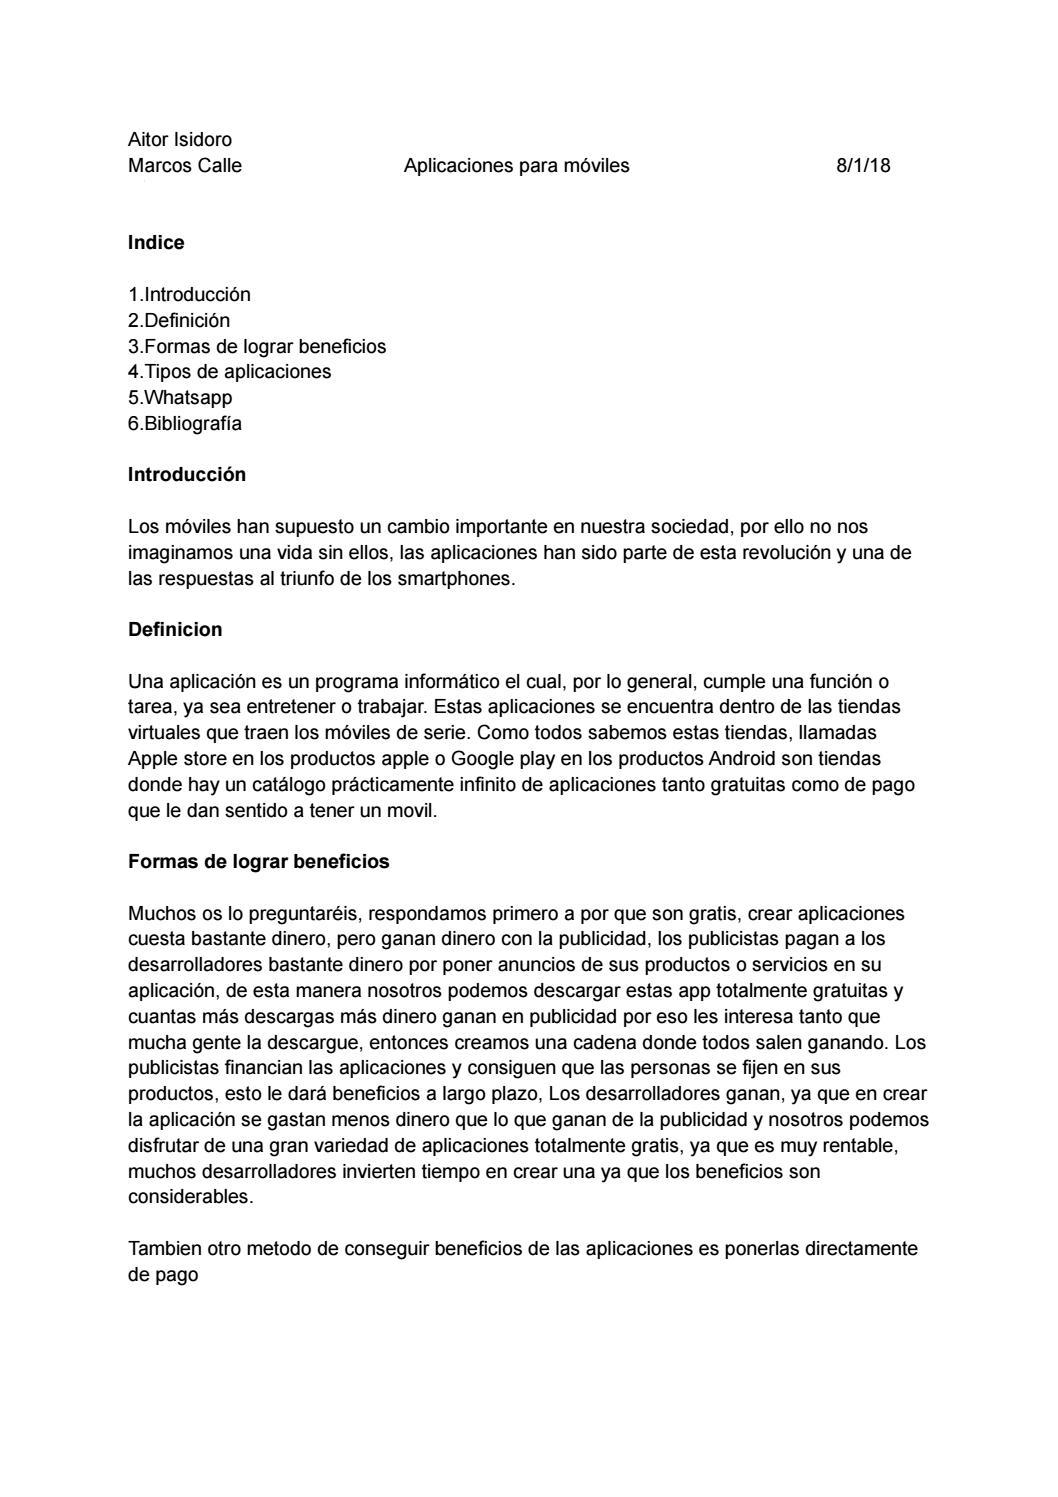 Aplicaciones para moviles, aitor i y marcos by aito1516 - issuu